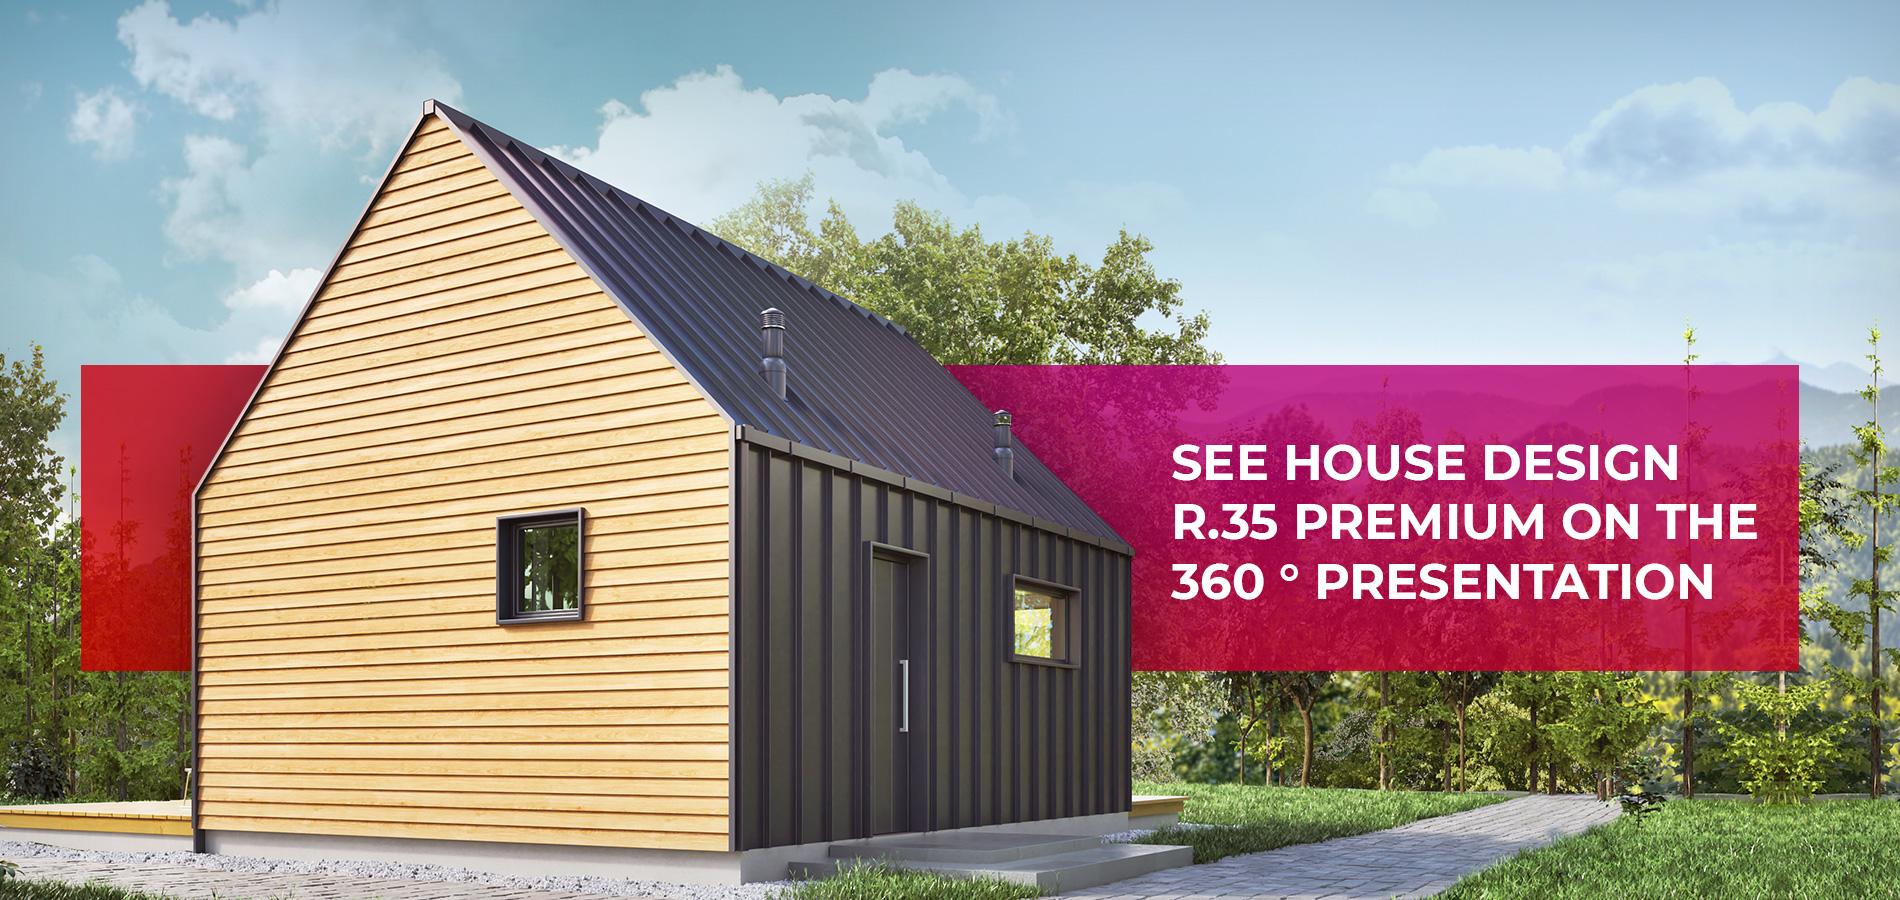 See house design R.35 Premium on the 360 ° presentation